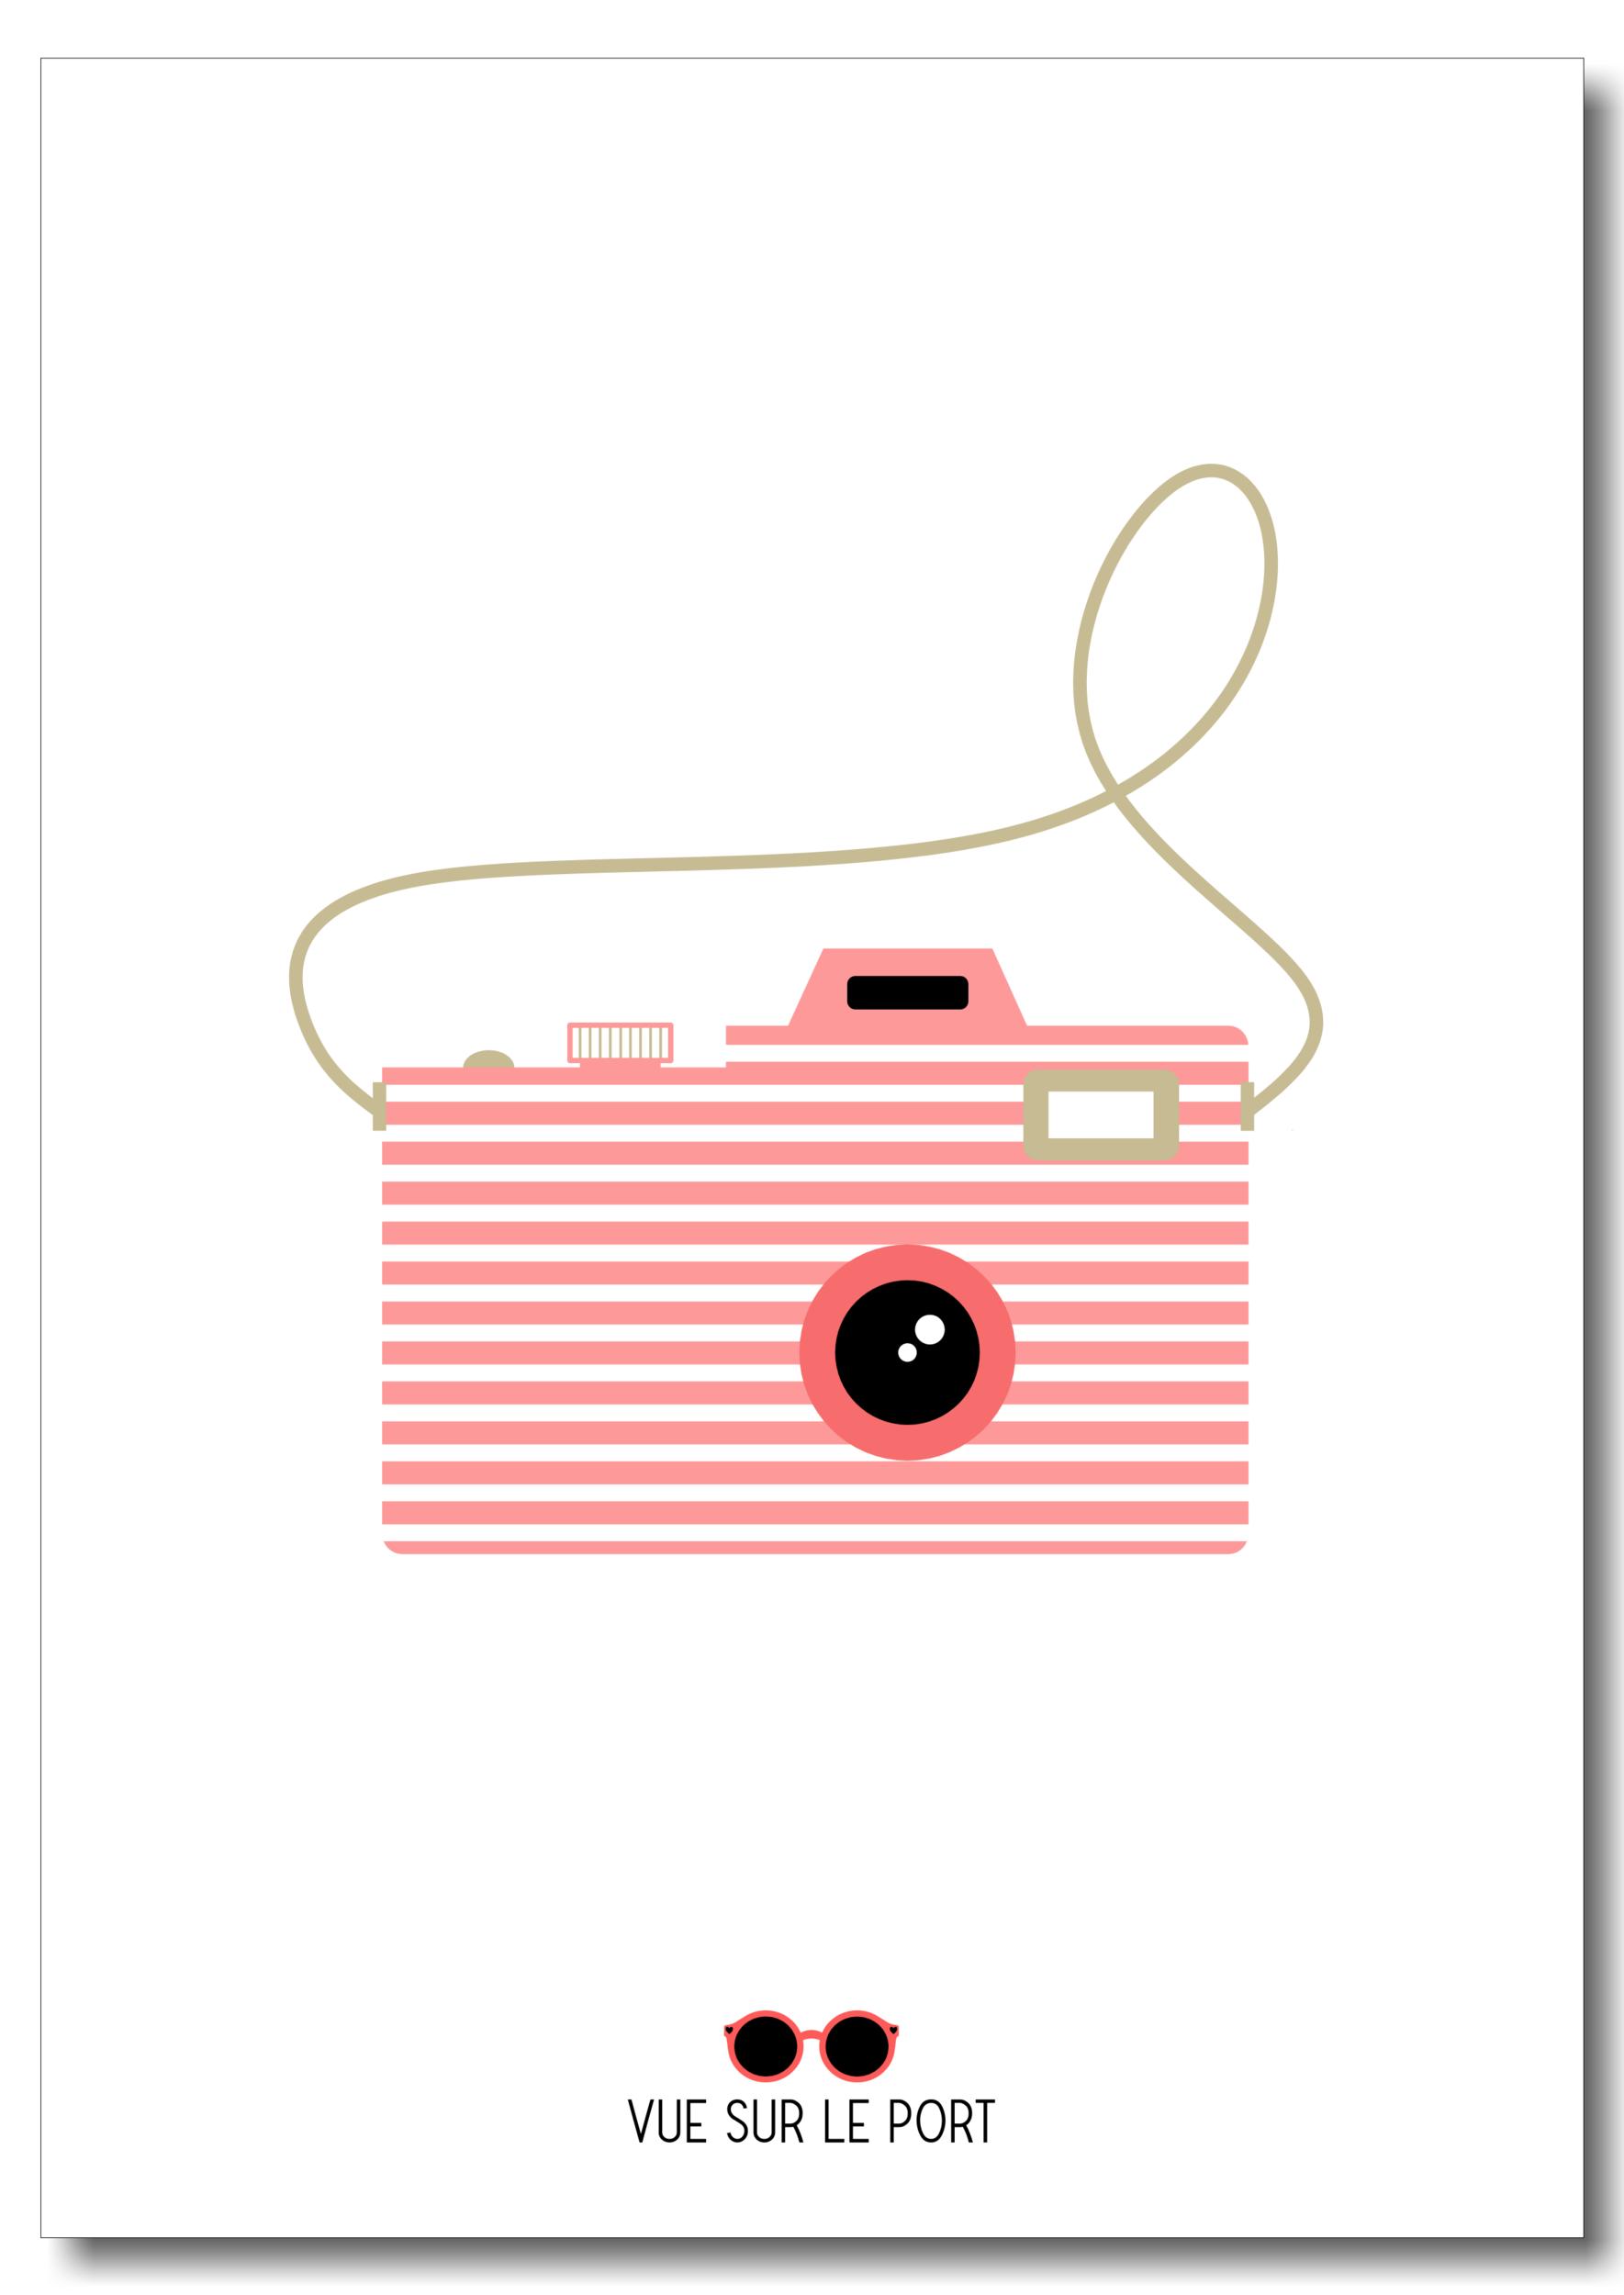 Affiche appareil photo